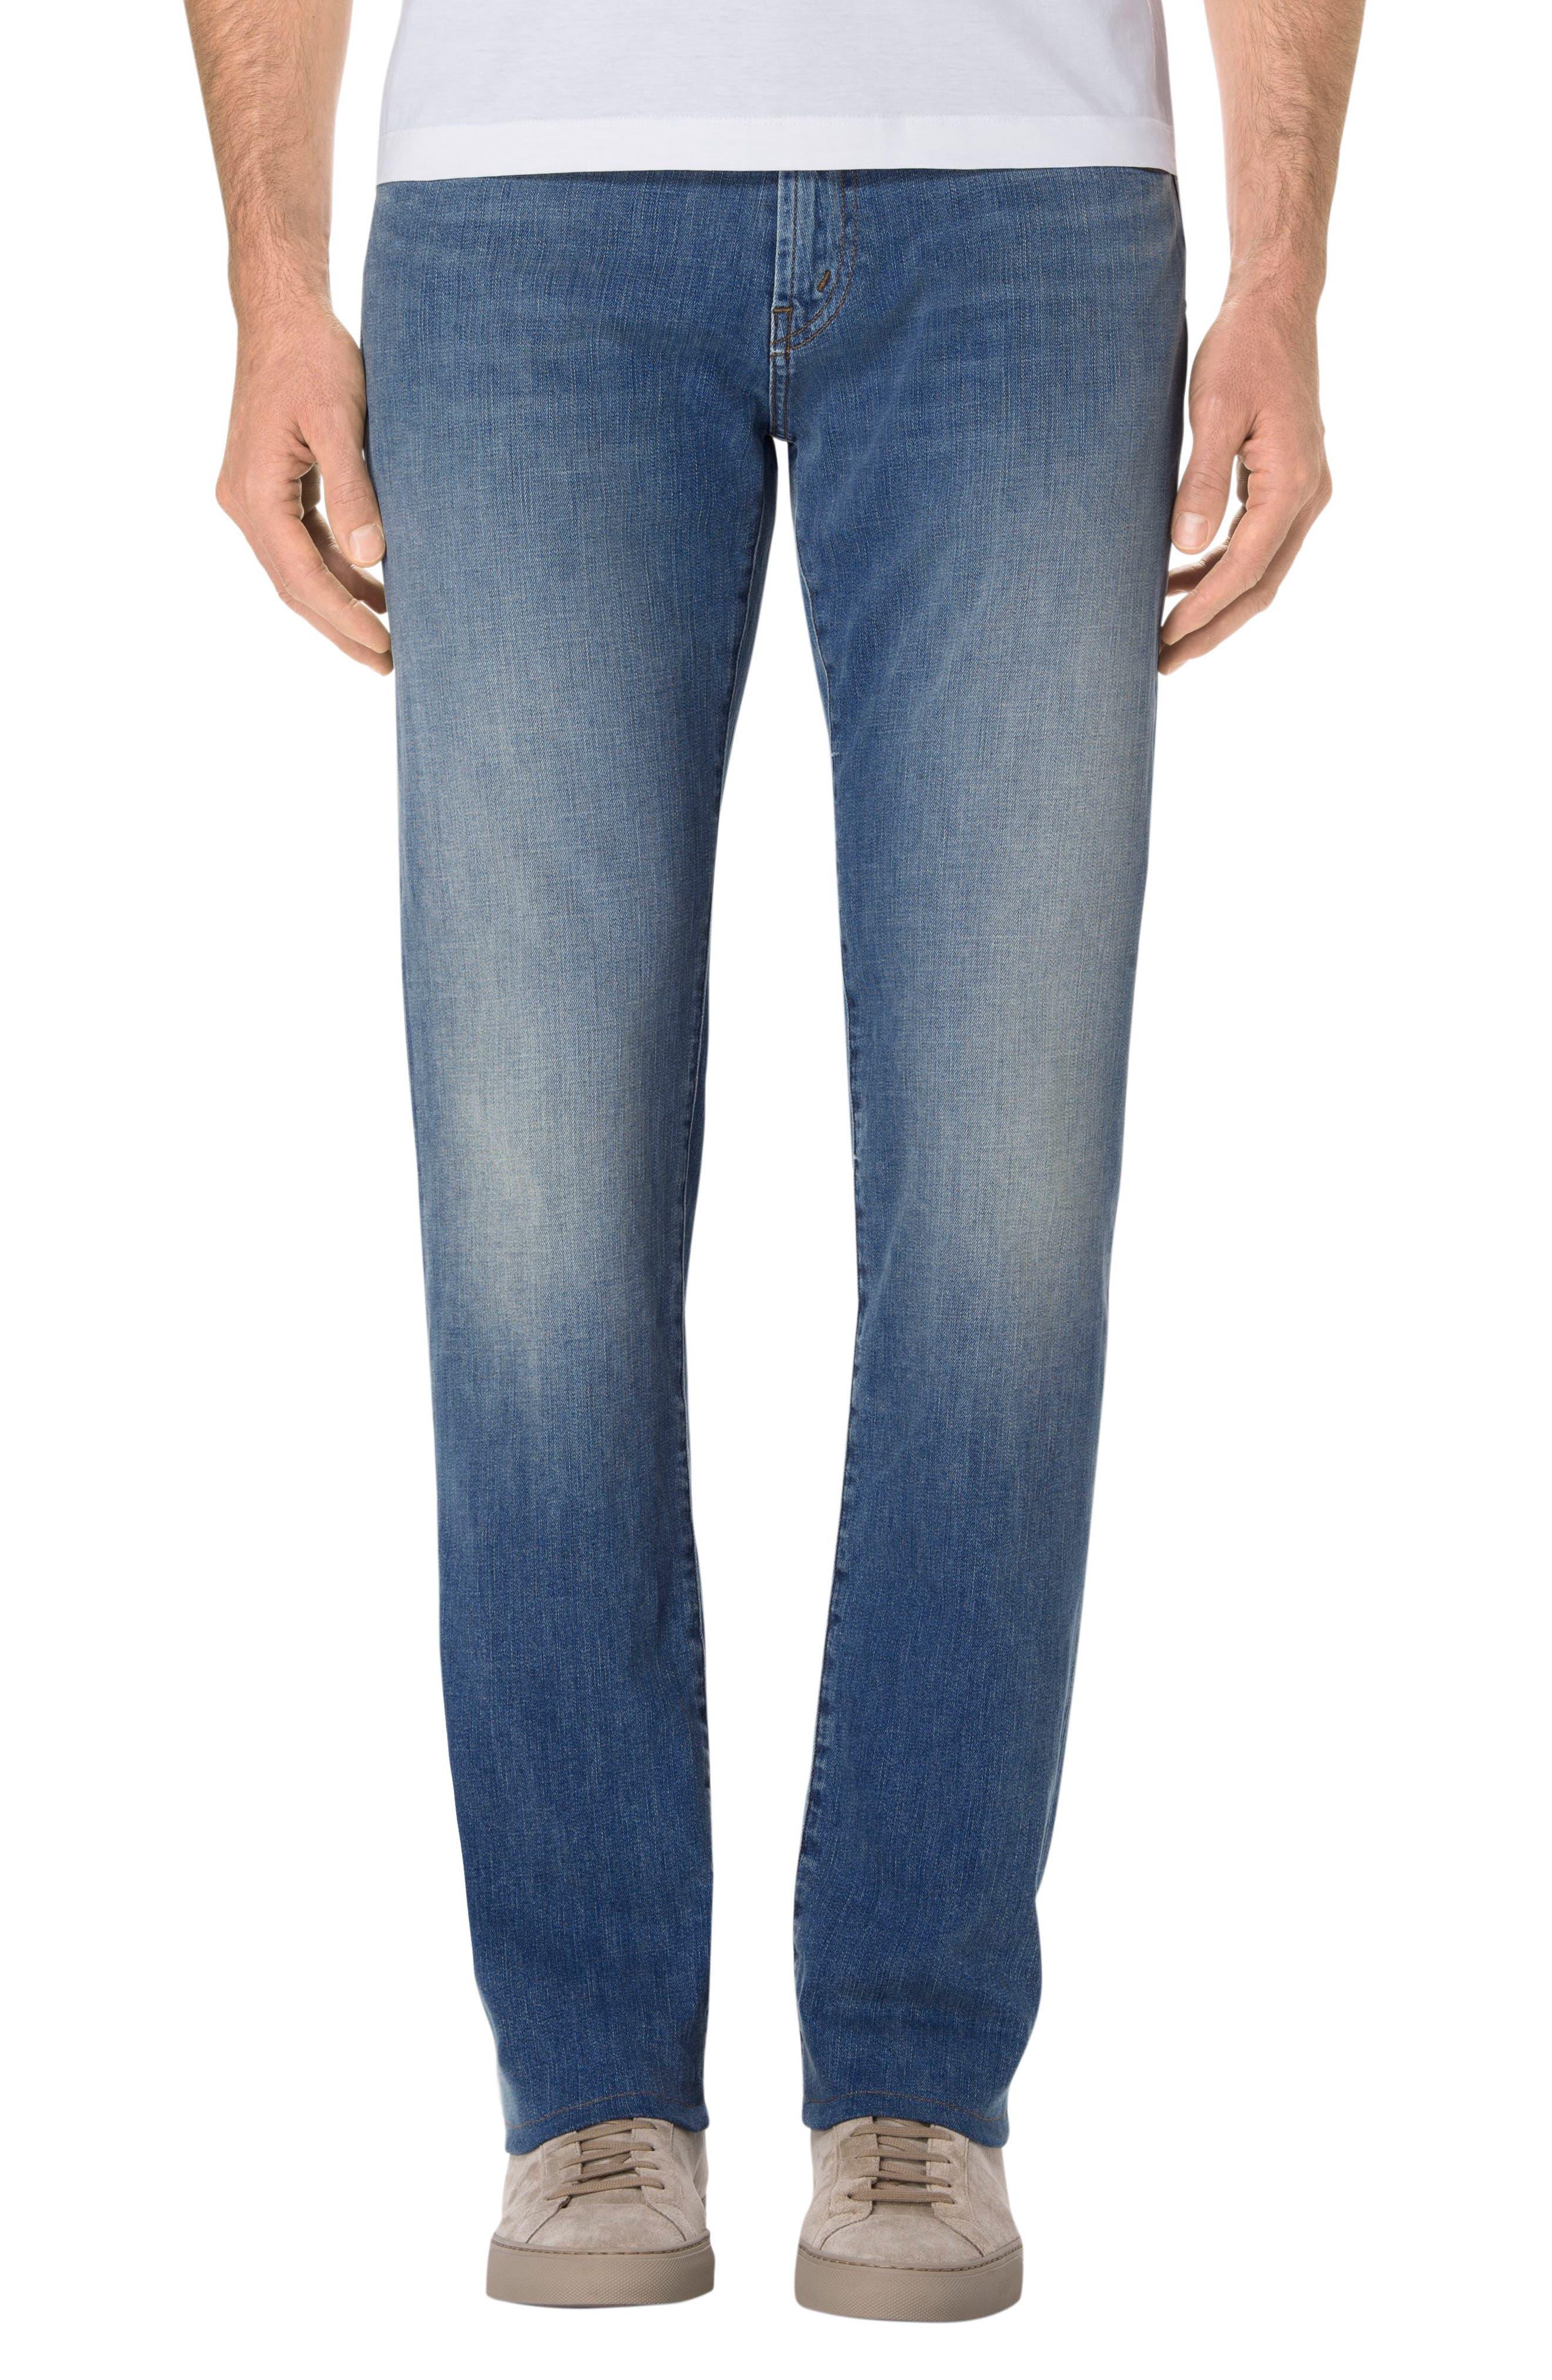 Kane Slim Straight Fit Jeans,                             Main thumbnail 1, color,                             452